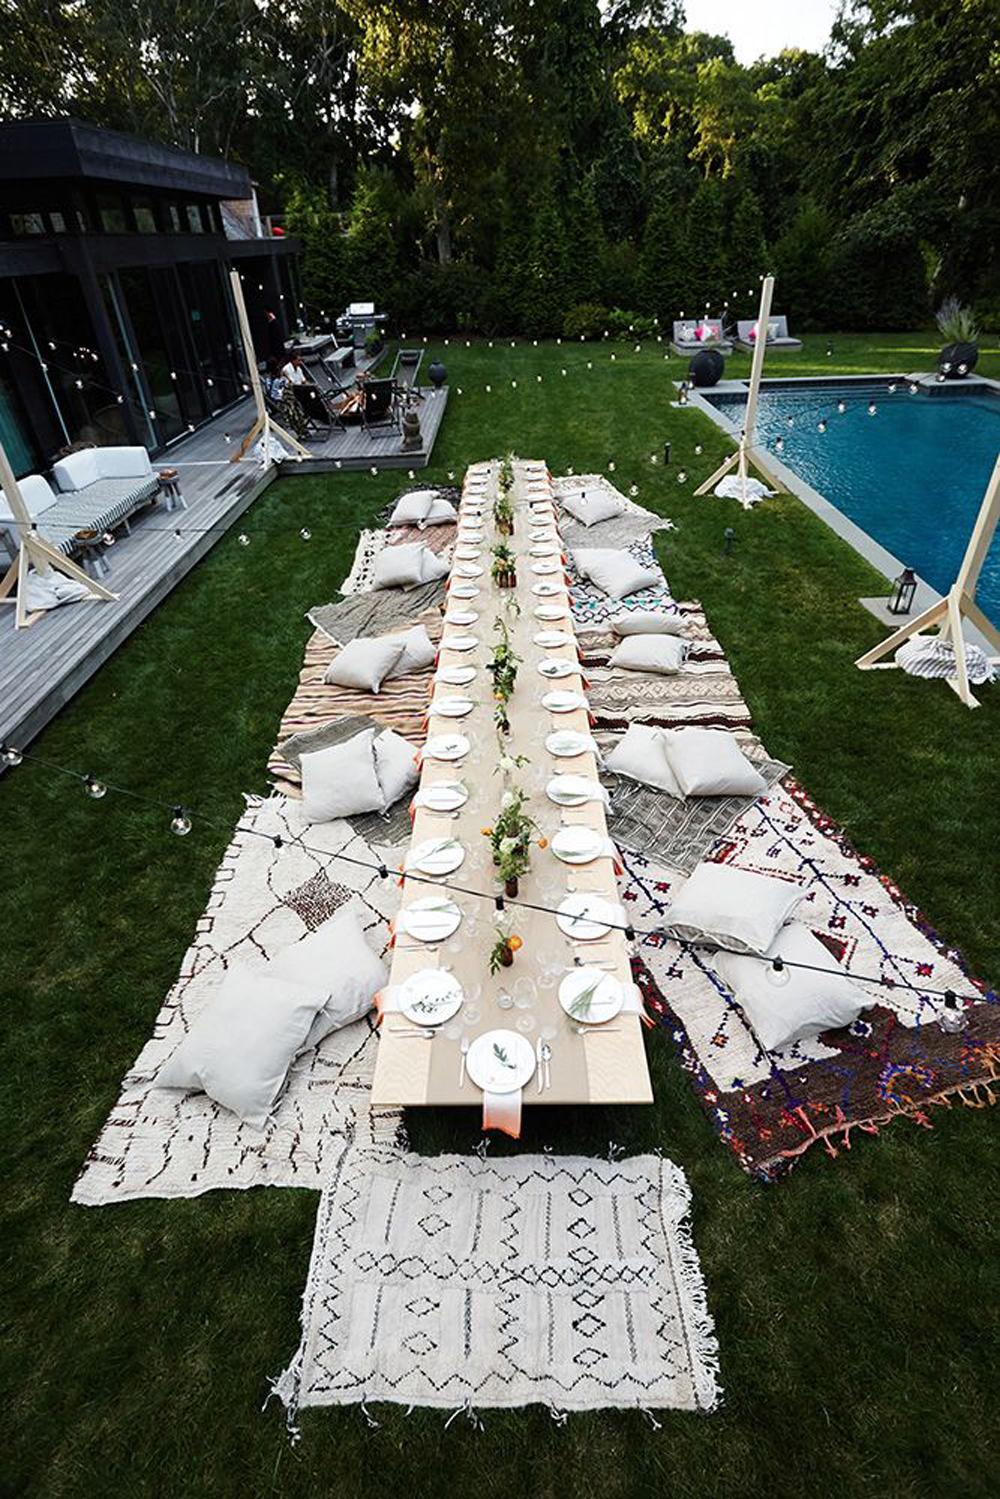 Il Pool Party Pi Chic Tra Gelati E Biancheria Caleffi